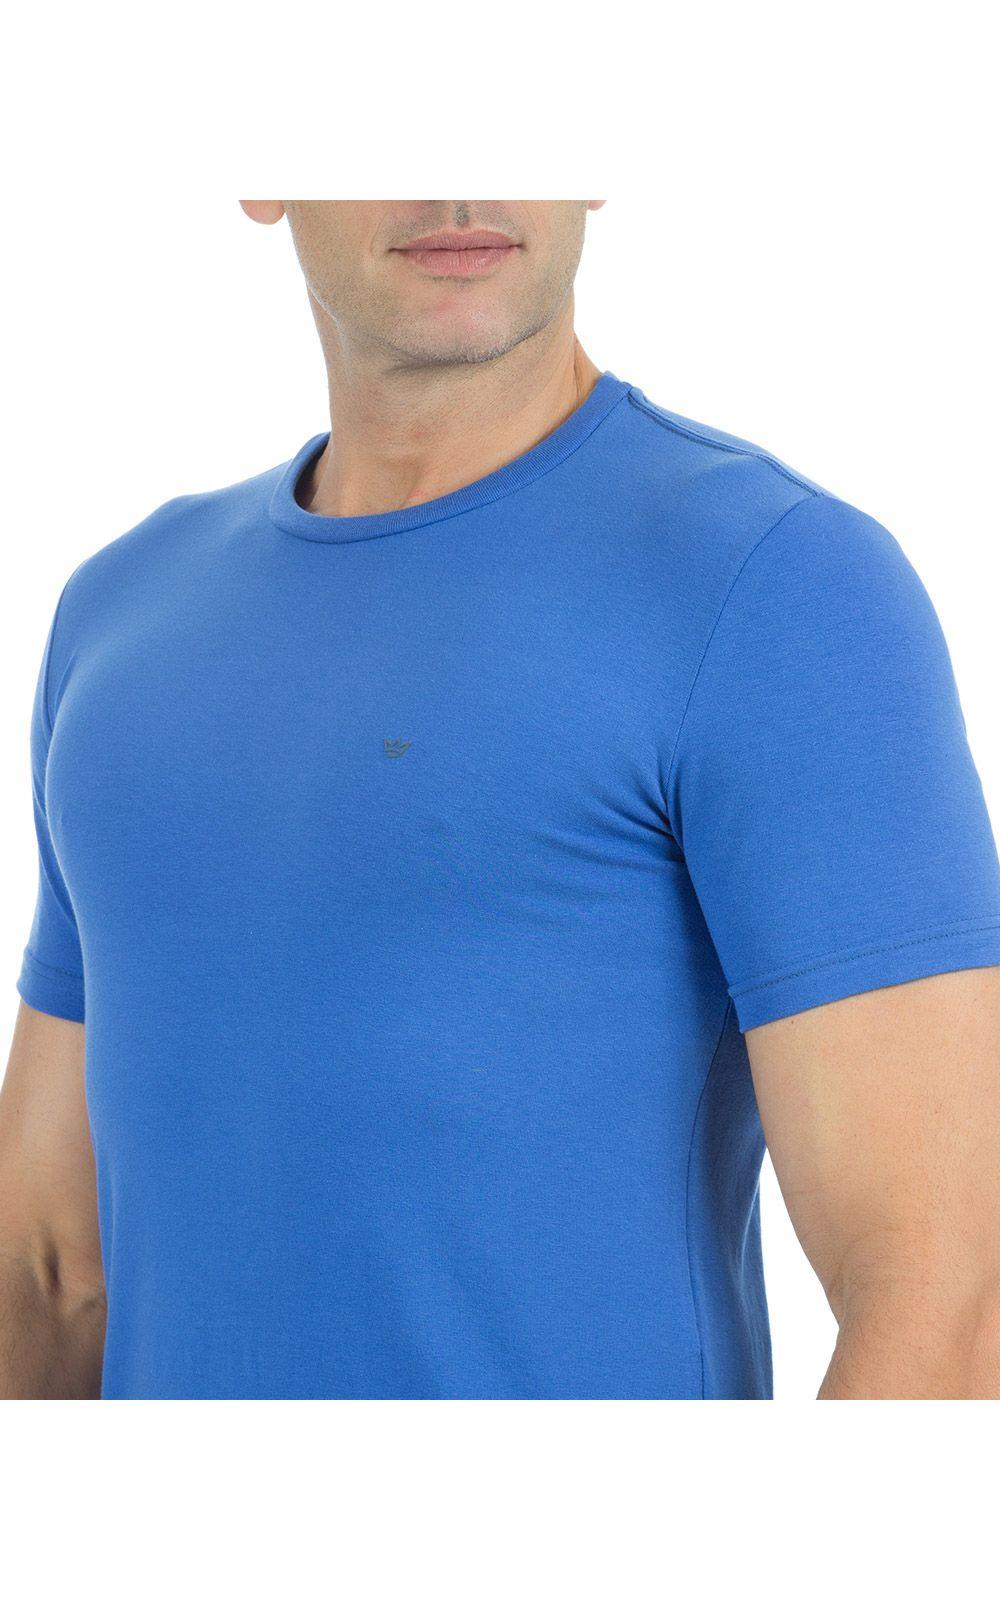 Foto 3 - Camiseta Masculina Azul Lisa